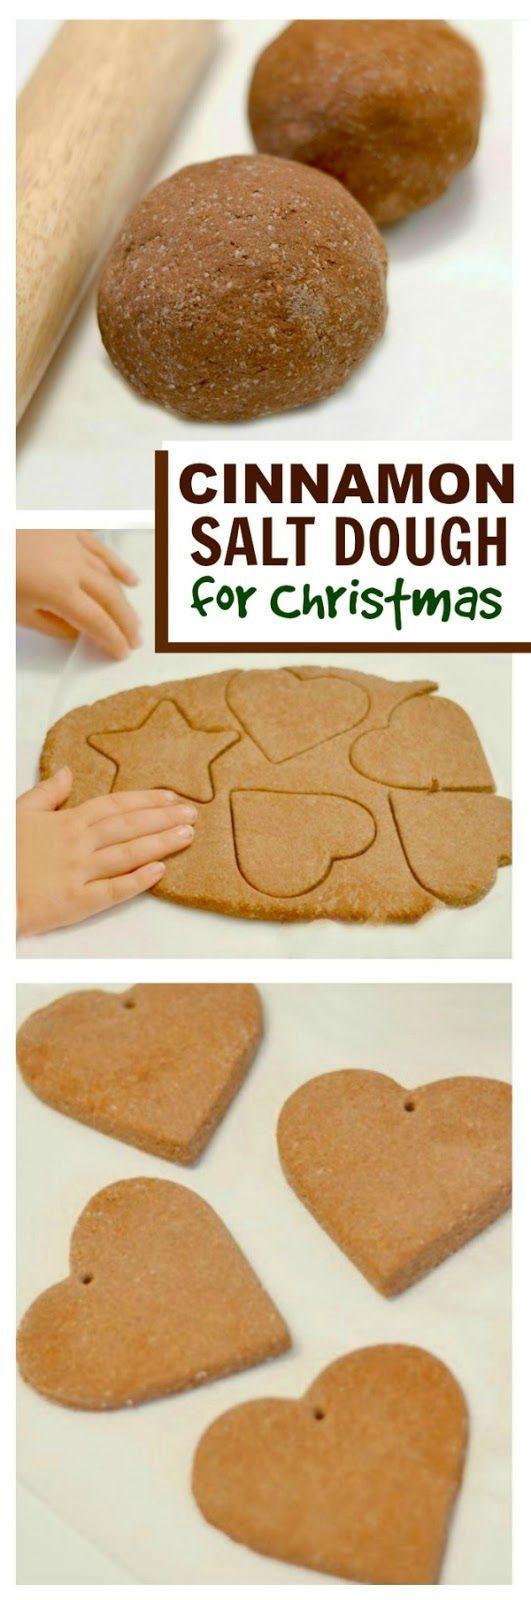 No Cook Cinnamon Salt Dough The Easiest Way To Make Cinnamon Ornaments For  The Tree